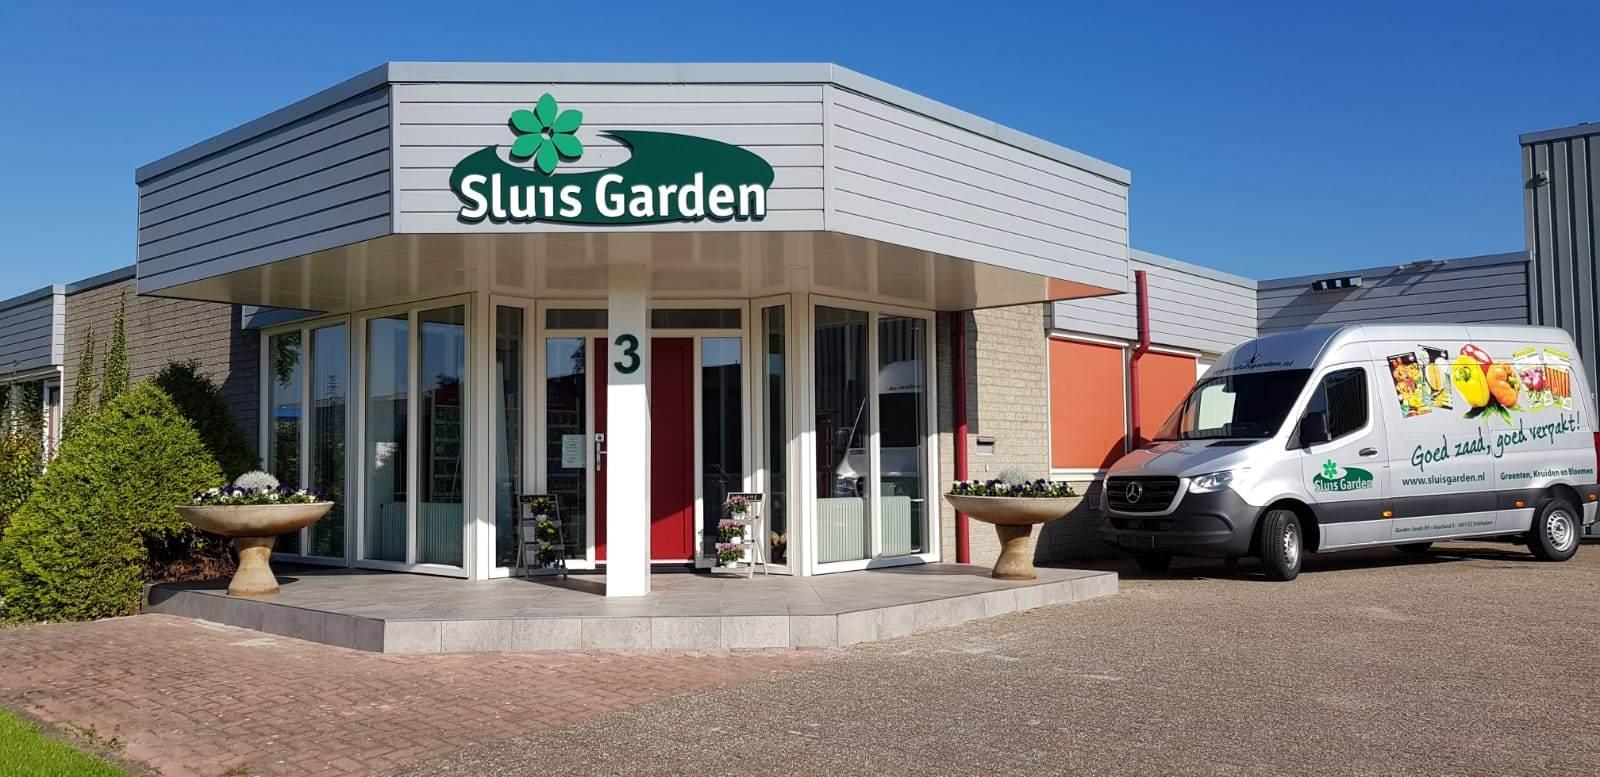 bedrijfspand sluis garden / promozaad